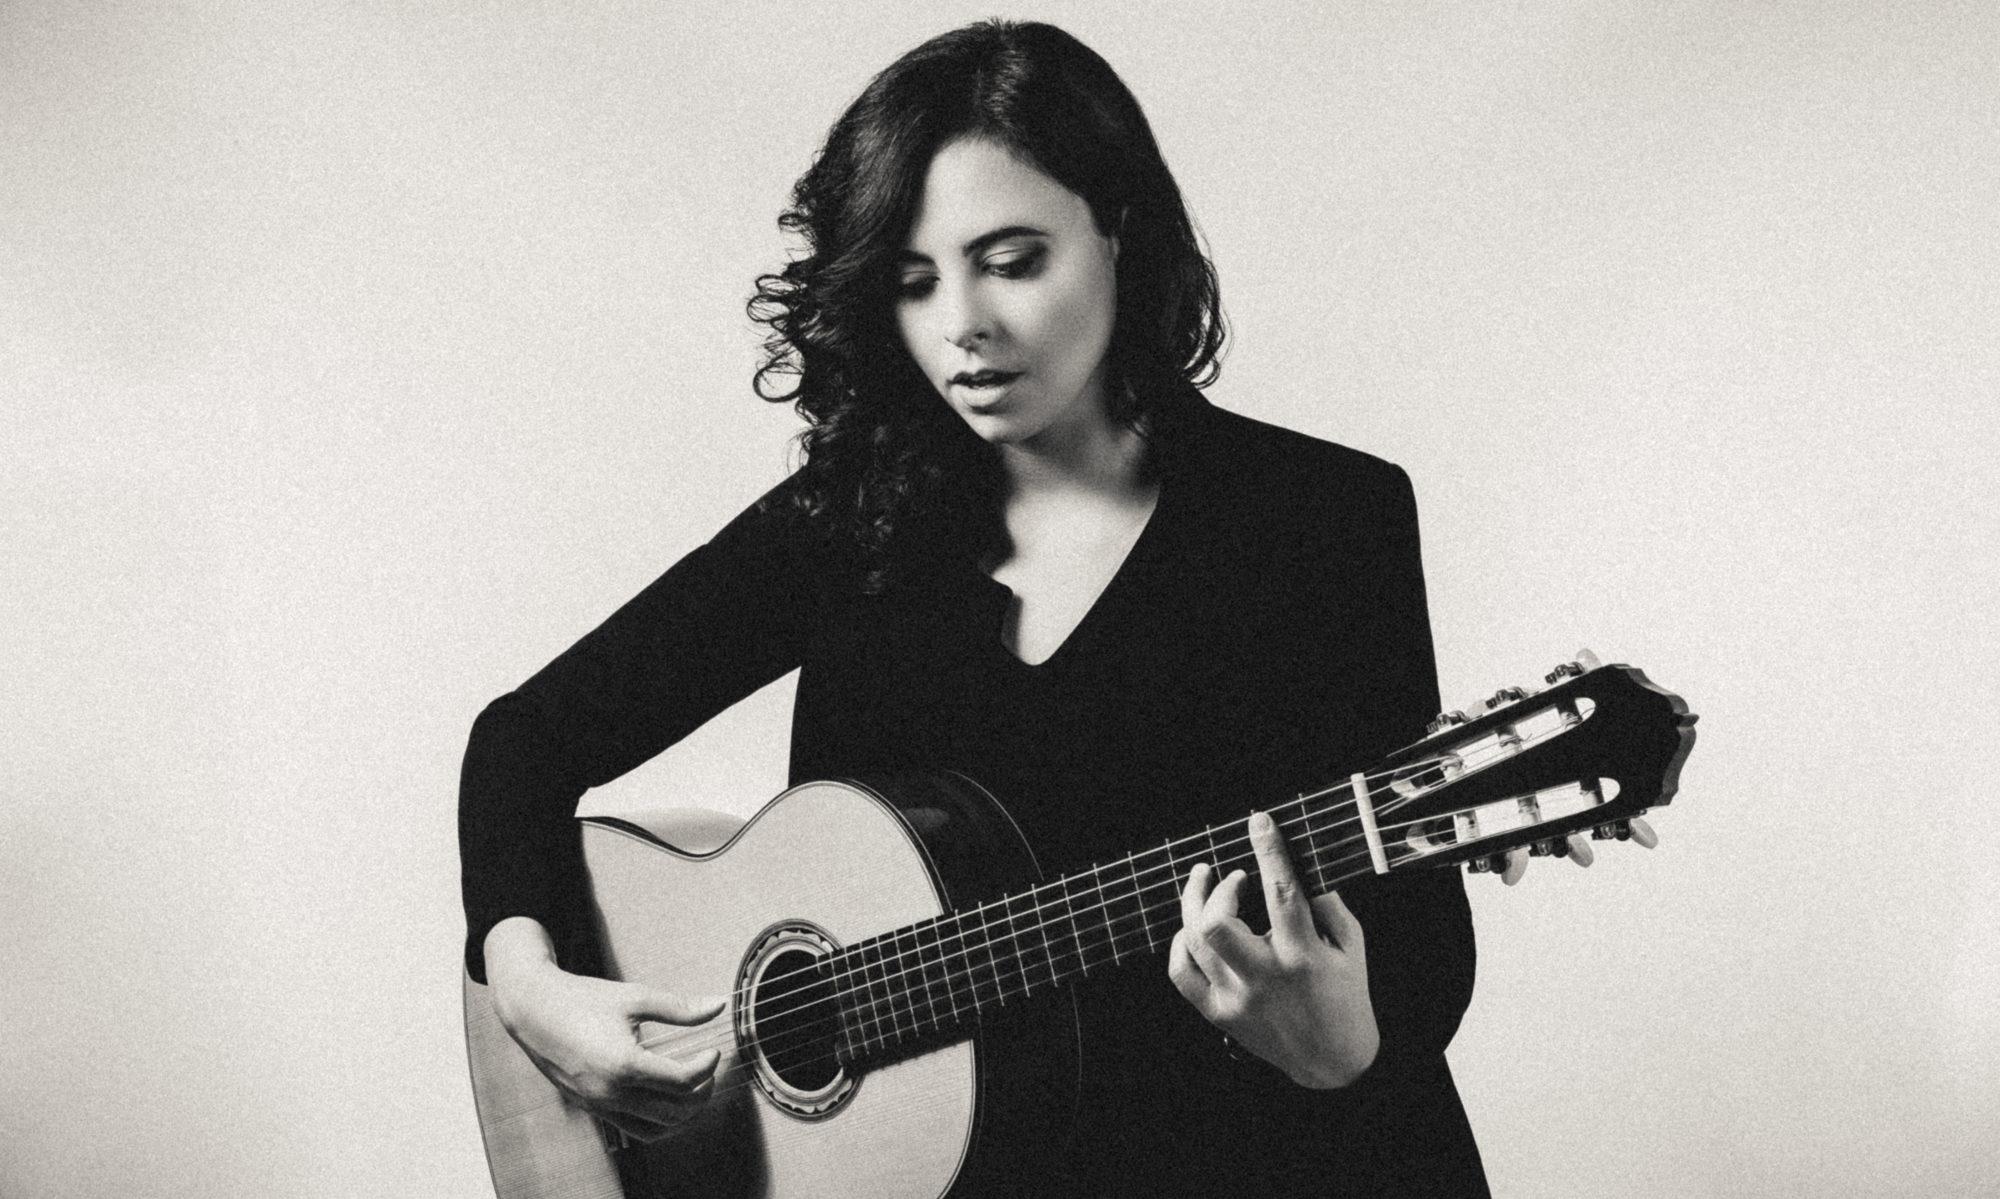 Matilde Oppizzi - guitarist